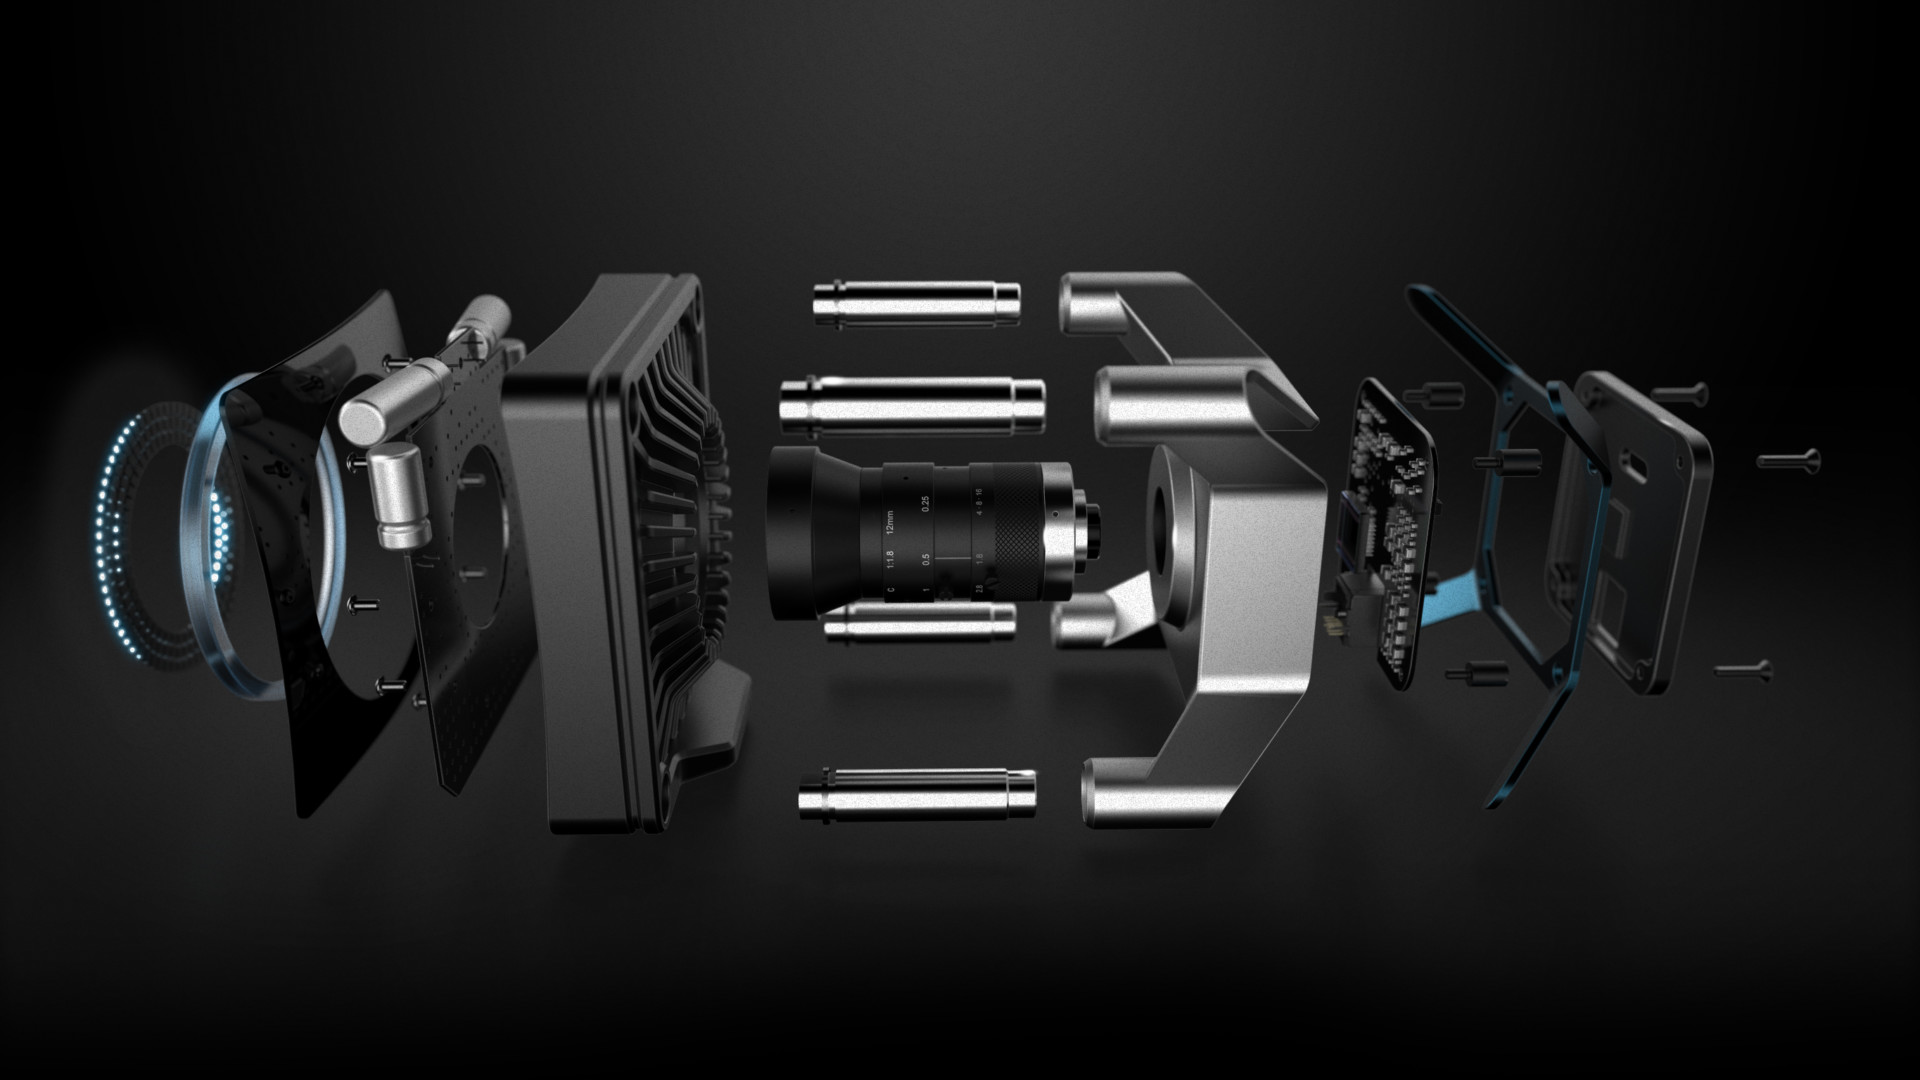 priority_designs_motion_capture_camera_design_and_development_008